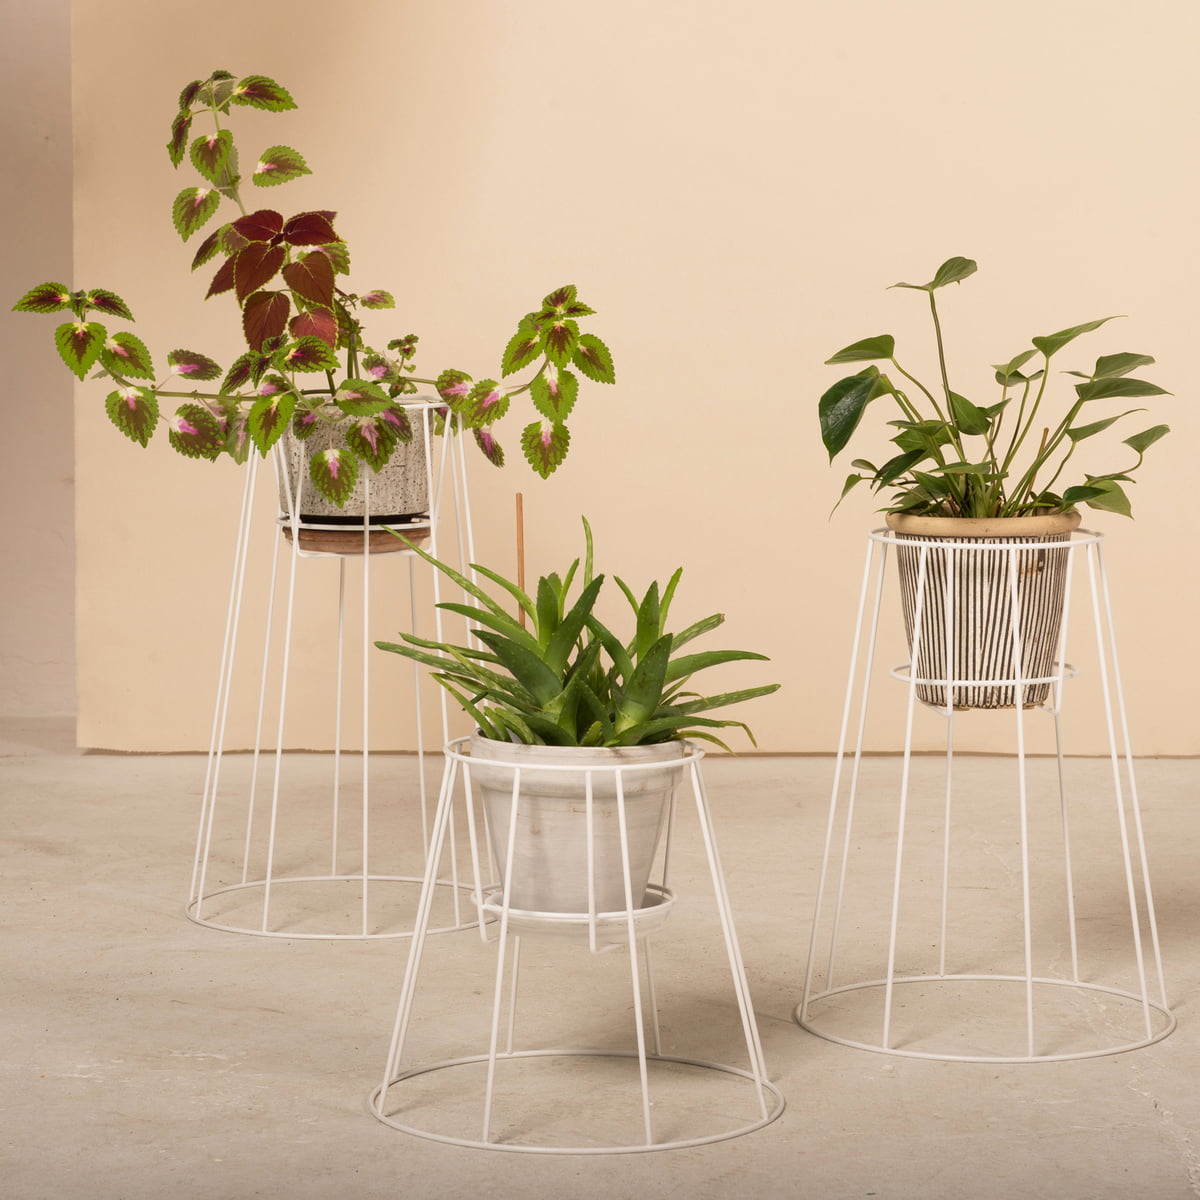 cibele blumentopfst nder von ok design. Black Bedroom Furniture Sets. Home Design Ideas